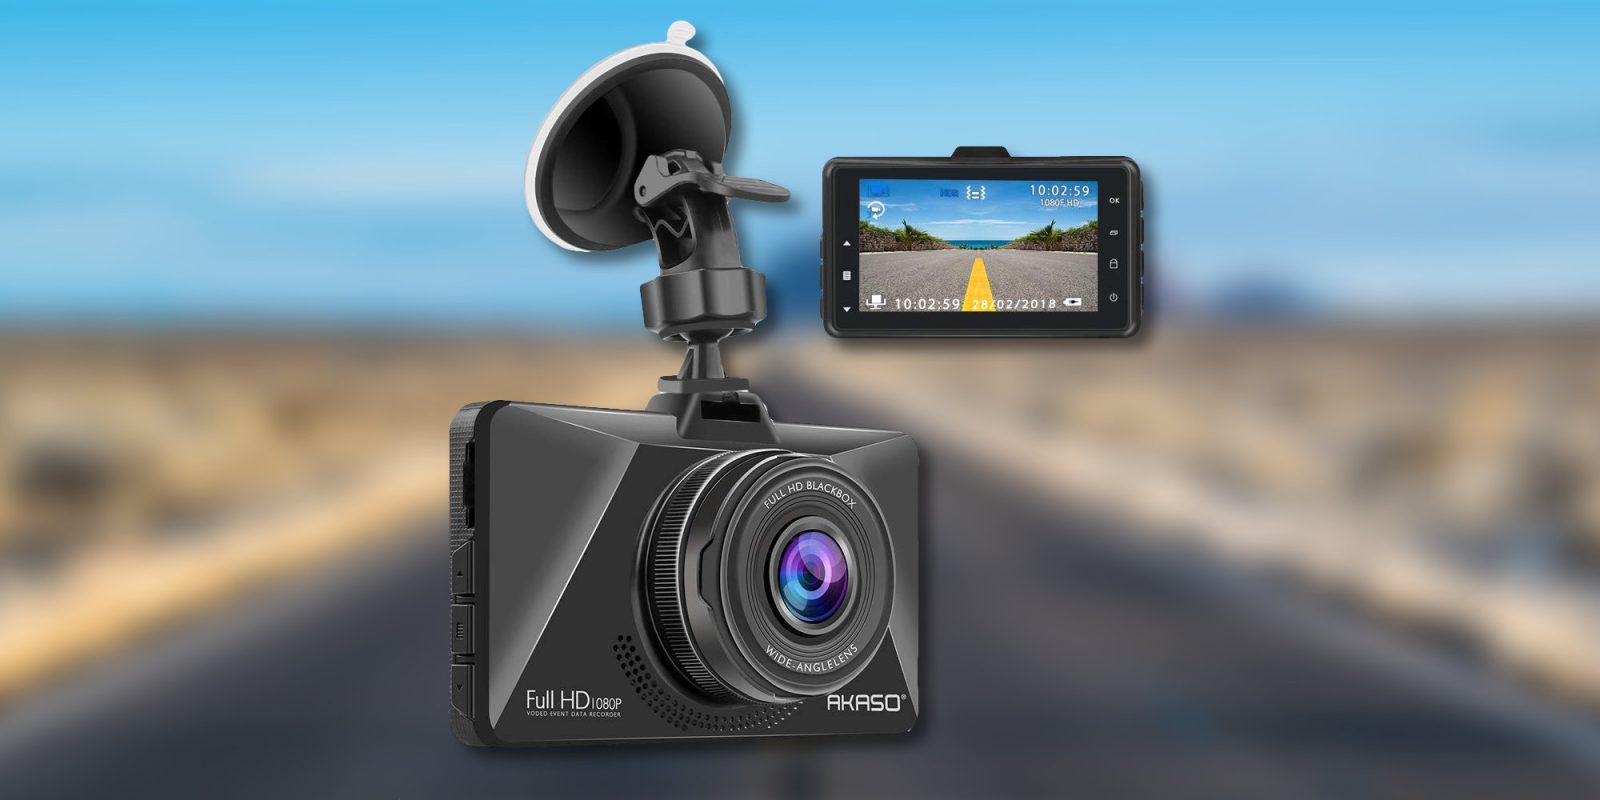 At $25, it's time to put a 1080p dash cam in your car (Save 40%)